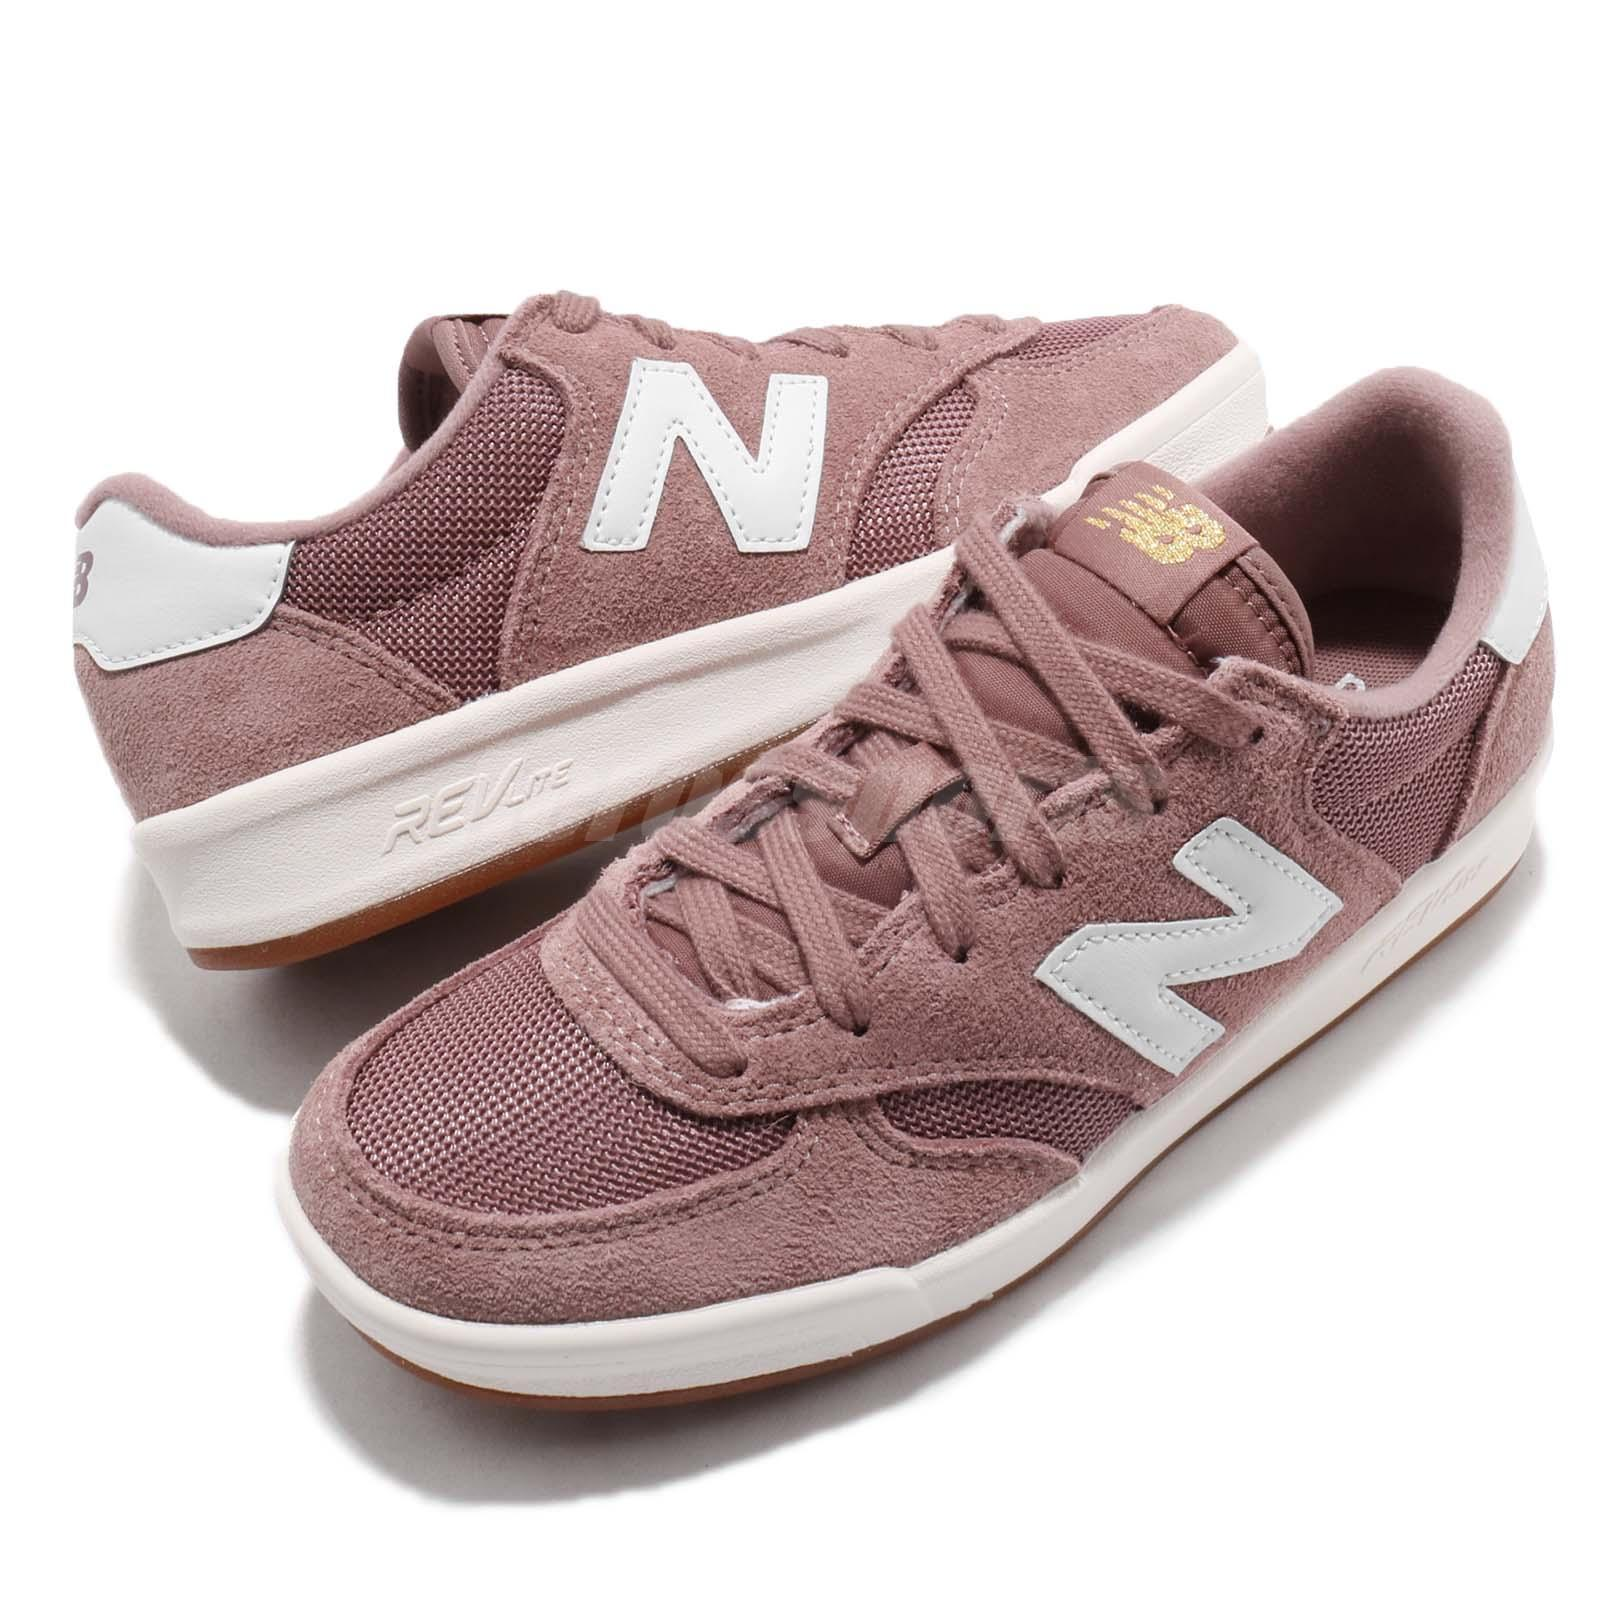 cáscara melocotón Burro  New Balance WRT300 B Dark Pink Suede Womens Lifestyle Casual Shoes WRT300FH  B | eBay